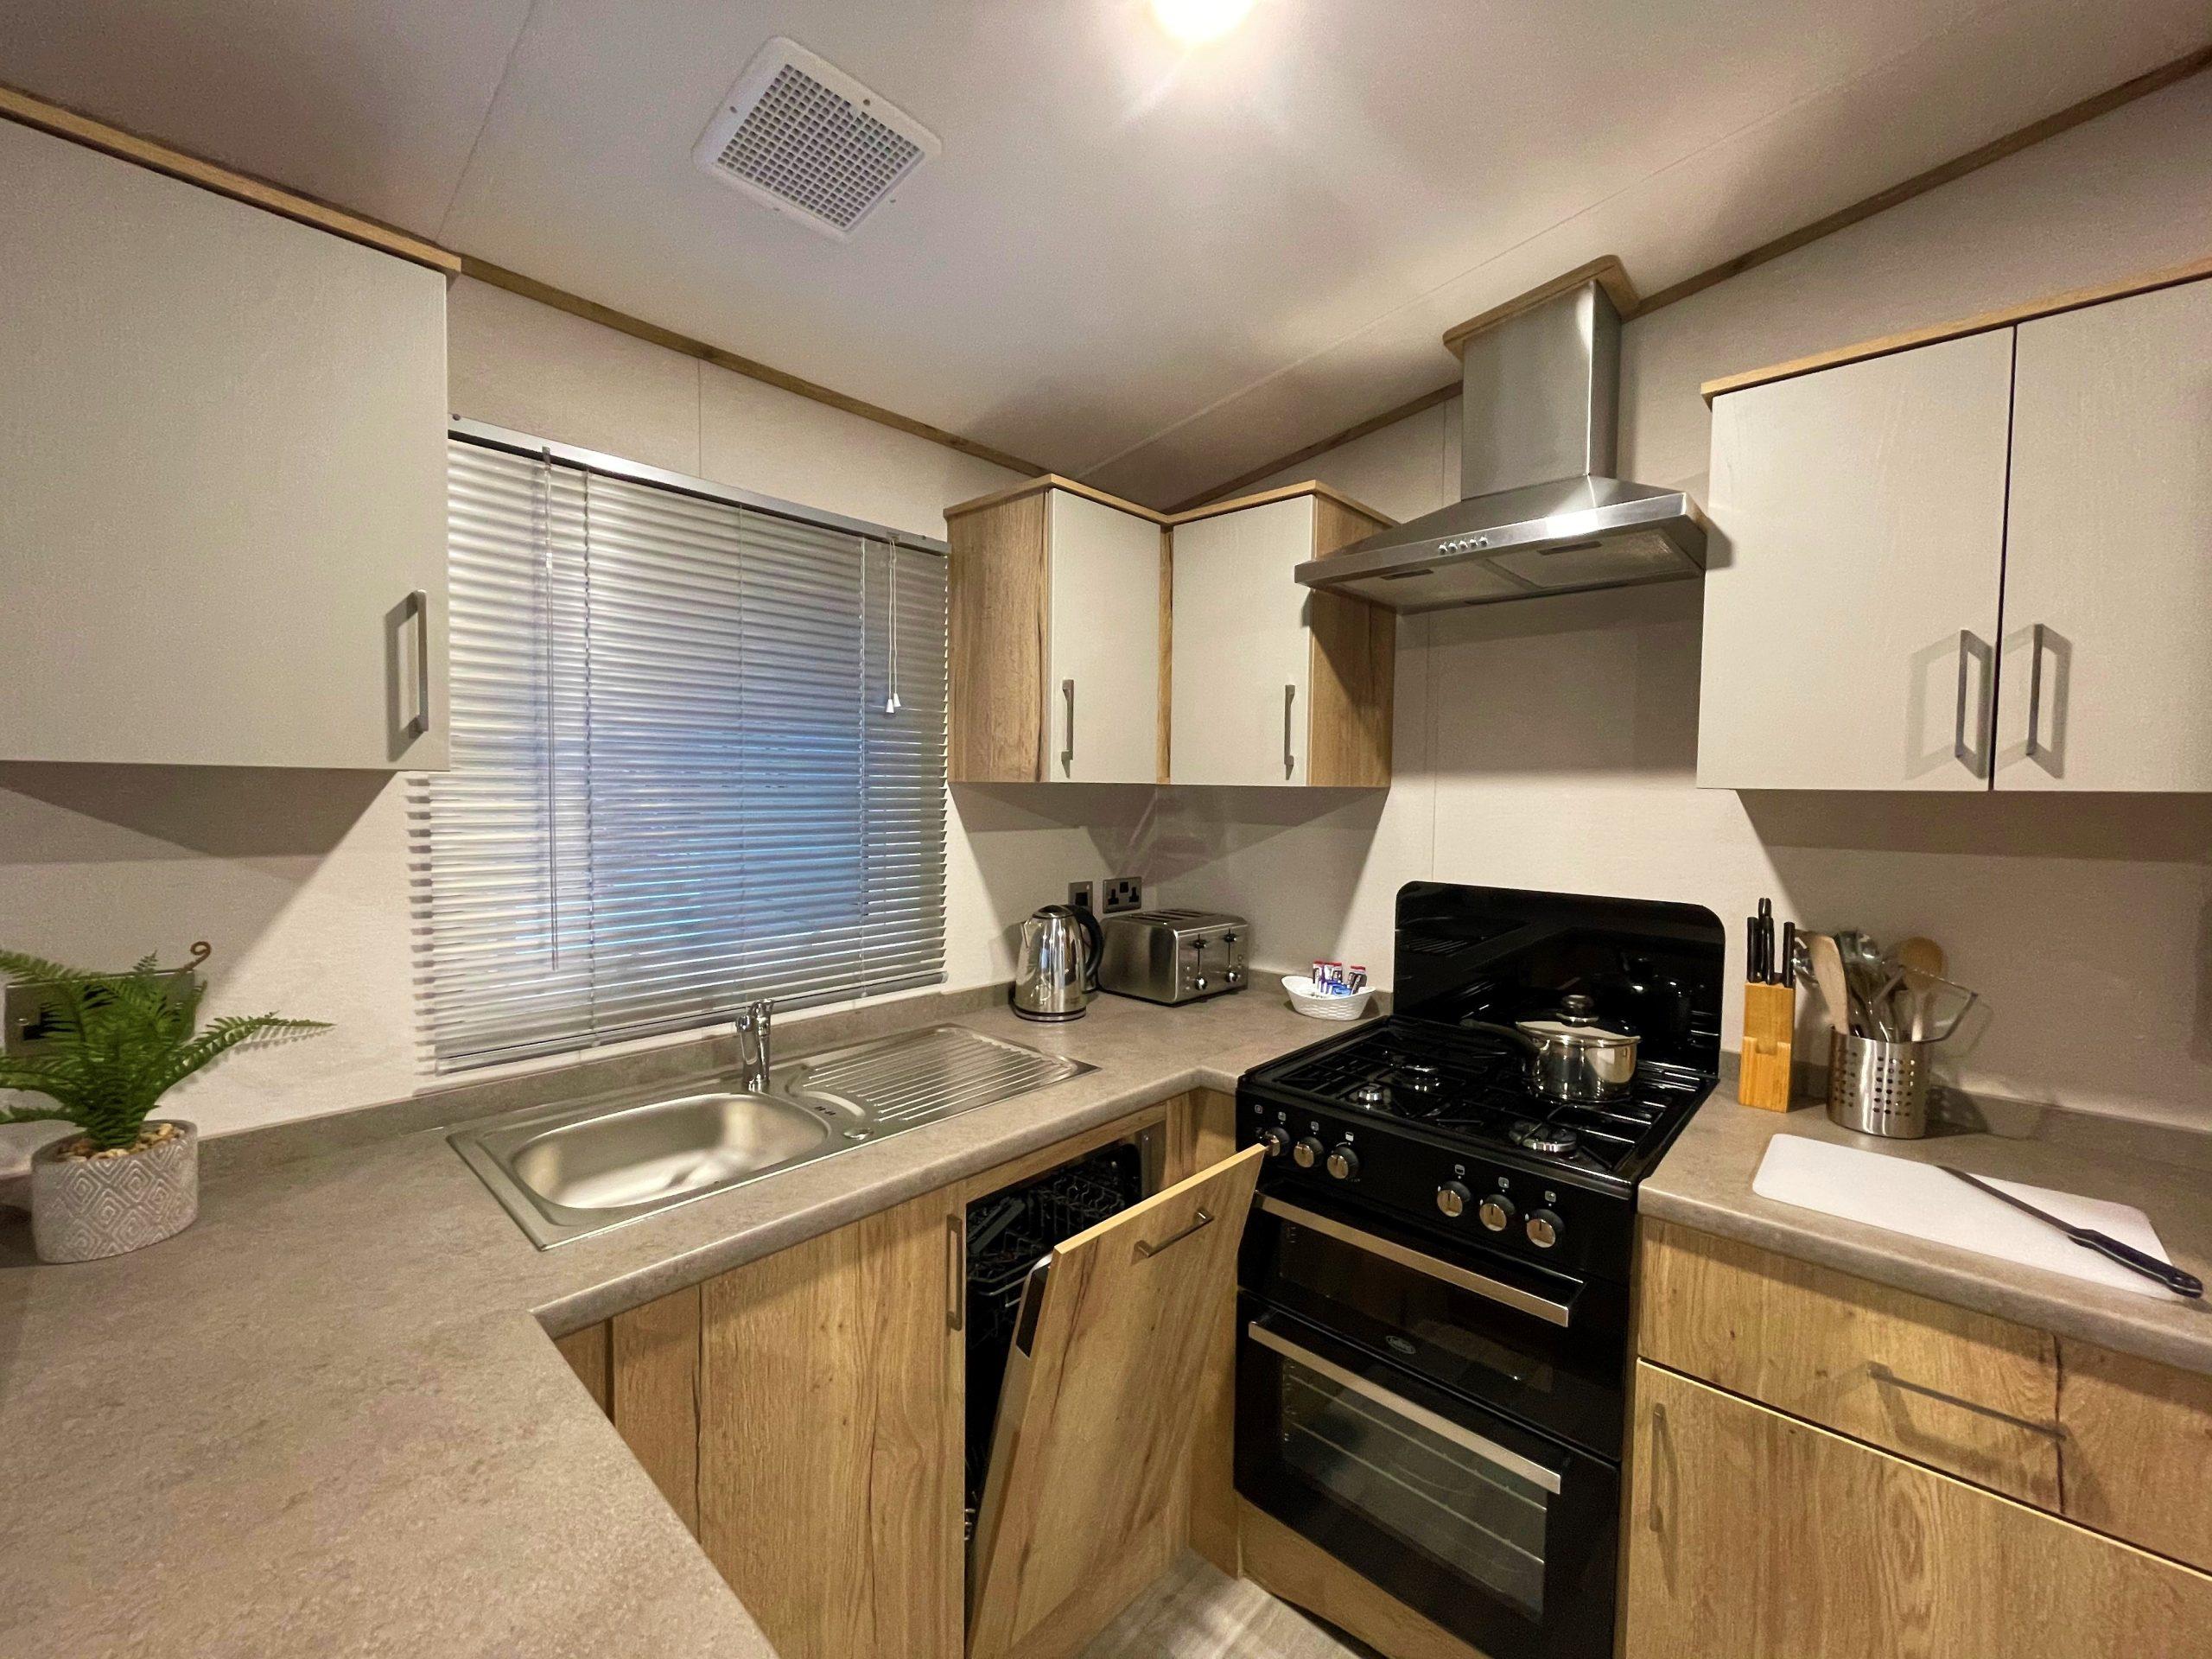 Holgates Holiday parks in Lancashire - Caravan kitchen